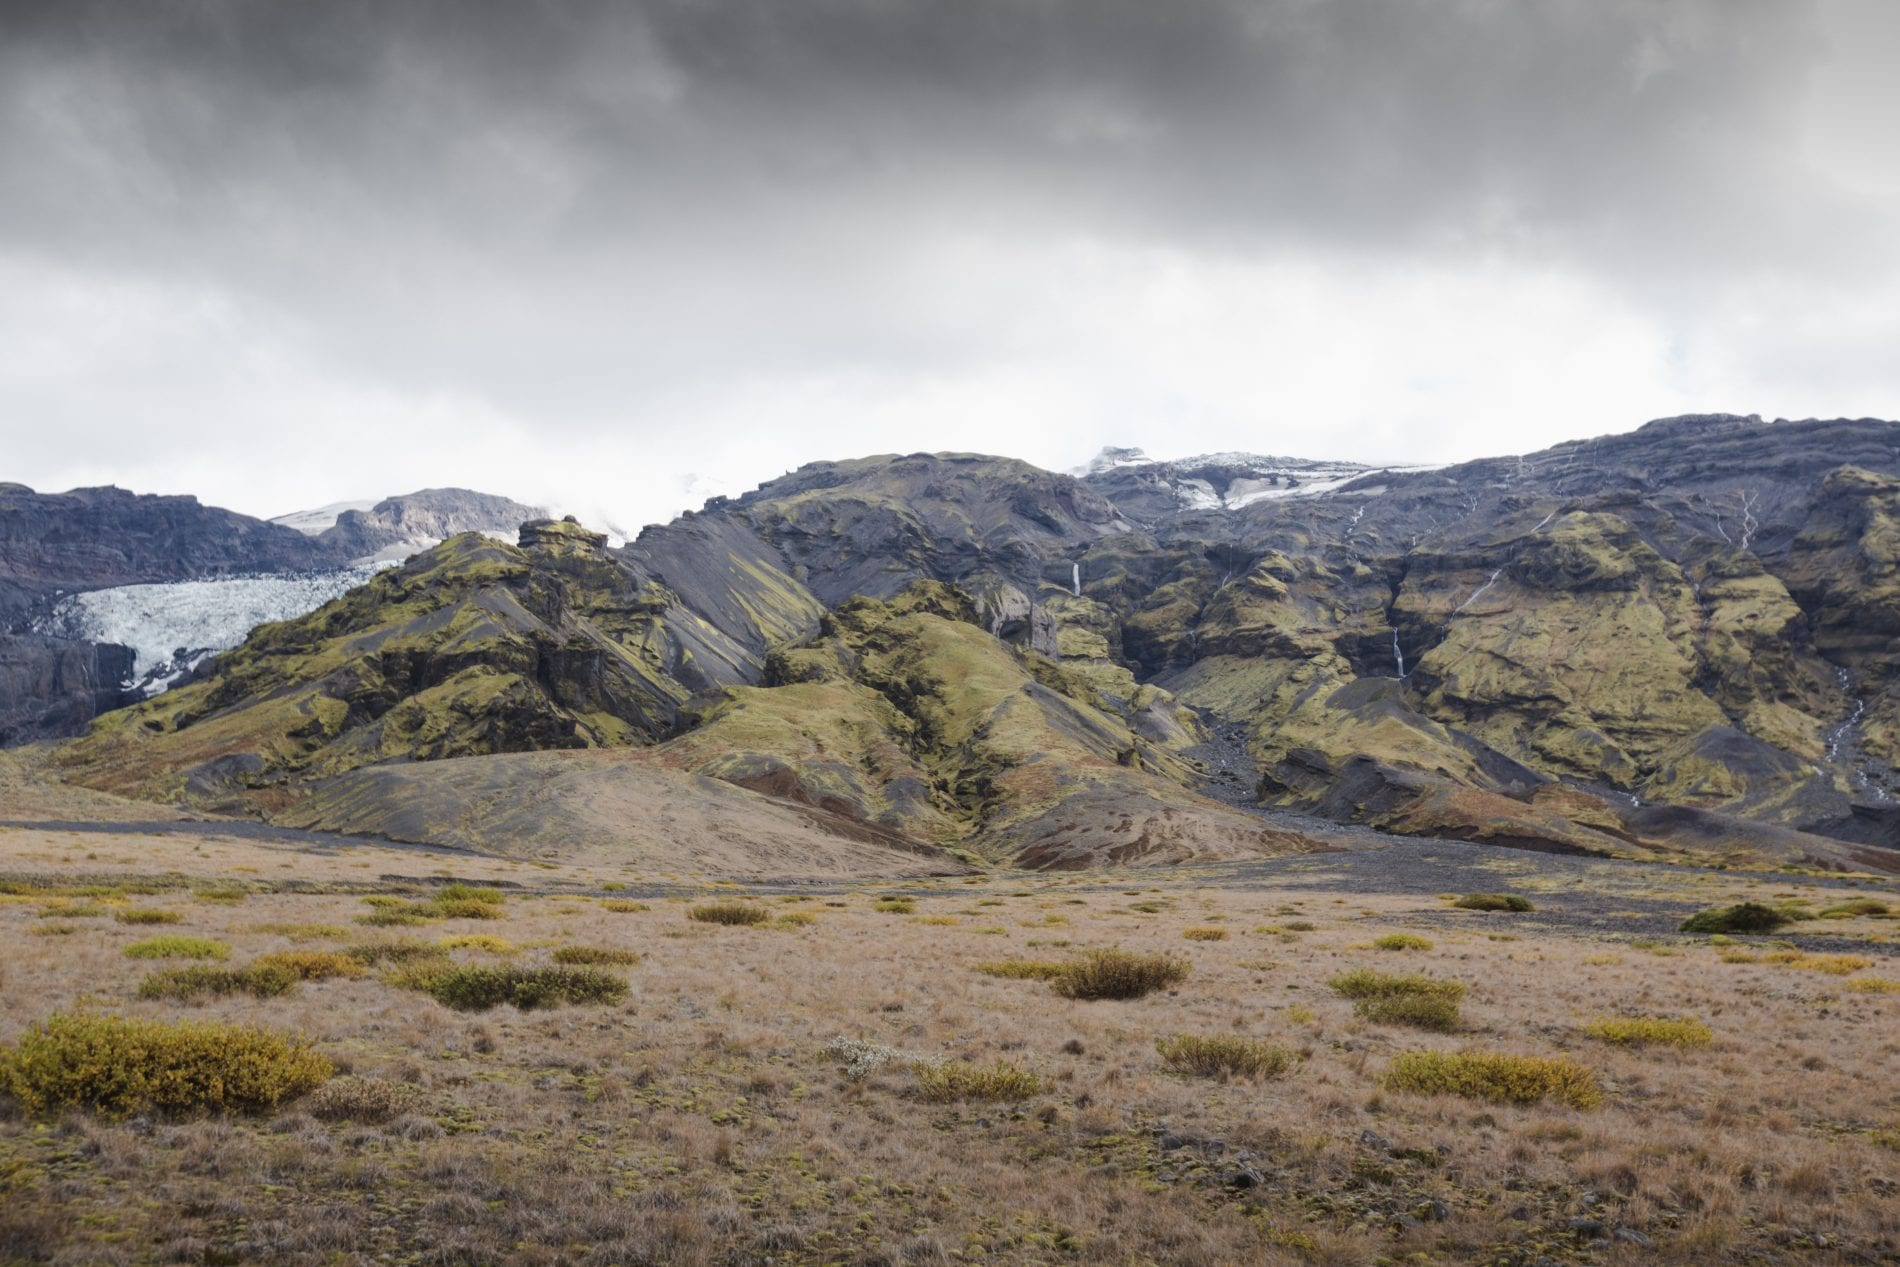 Snow, green shrubs and black rocks. The diverse landscape around Þórsmörk